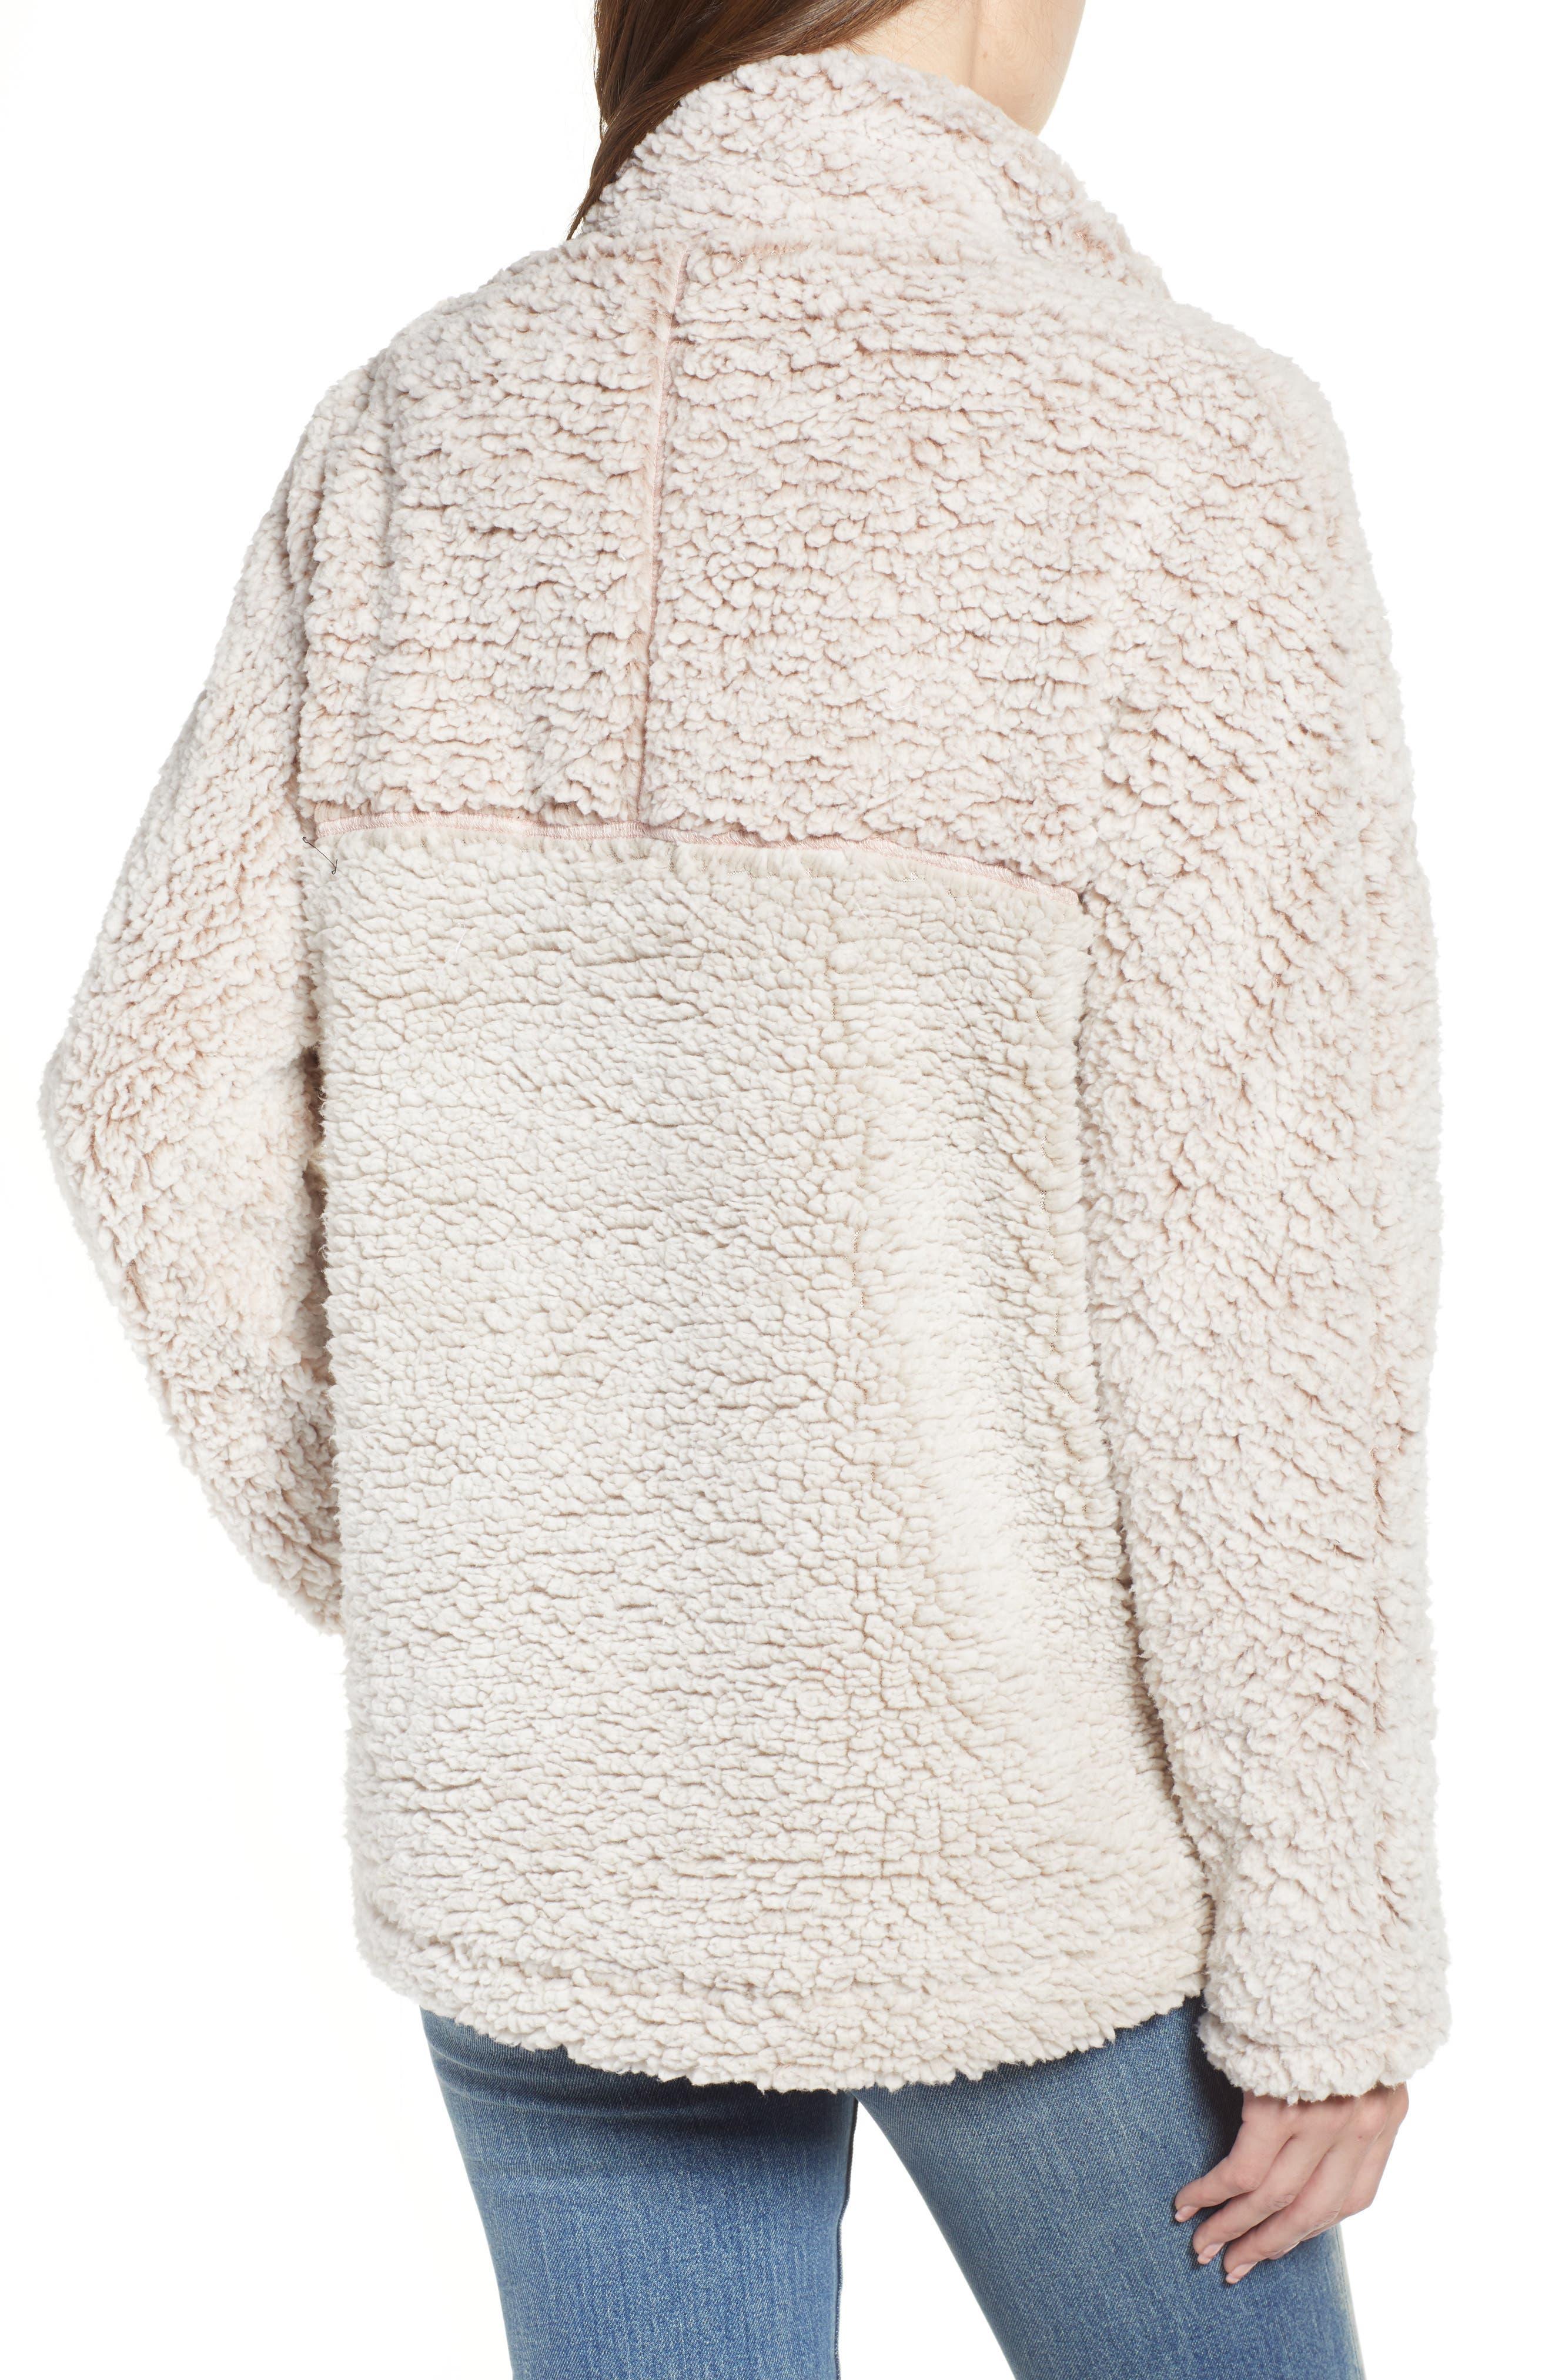 Colorblock Wubby Fleece Pullover,                             Alternate thumbnail 2, color,                             SMOKE ROSE IVORY